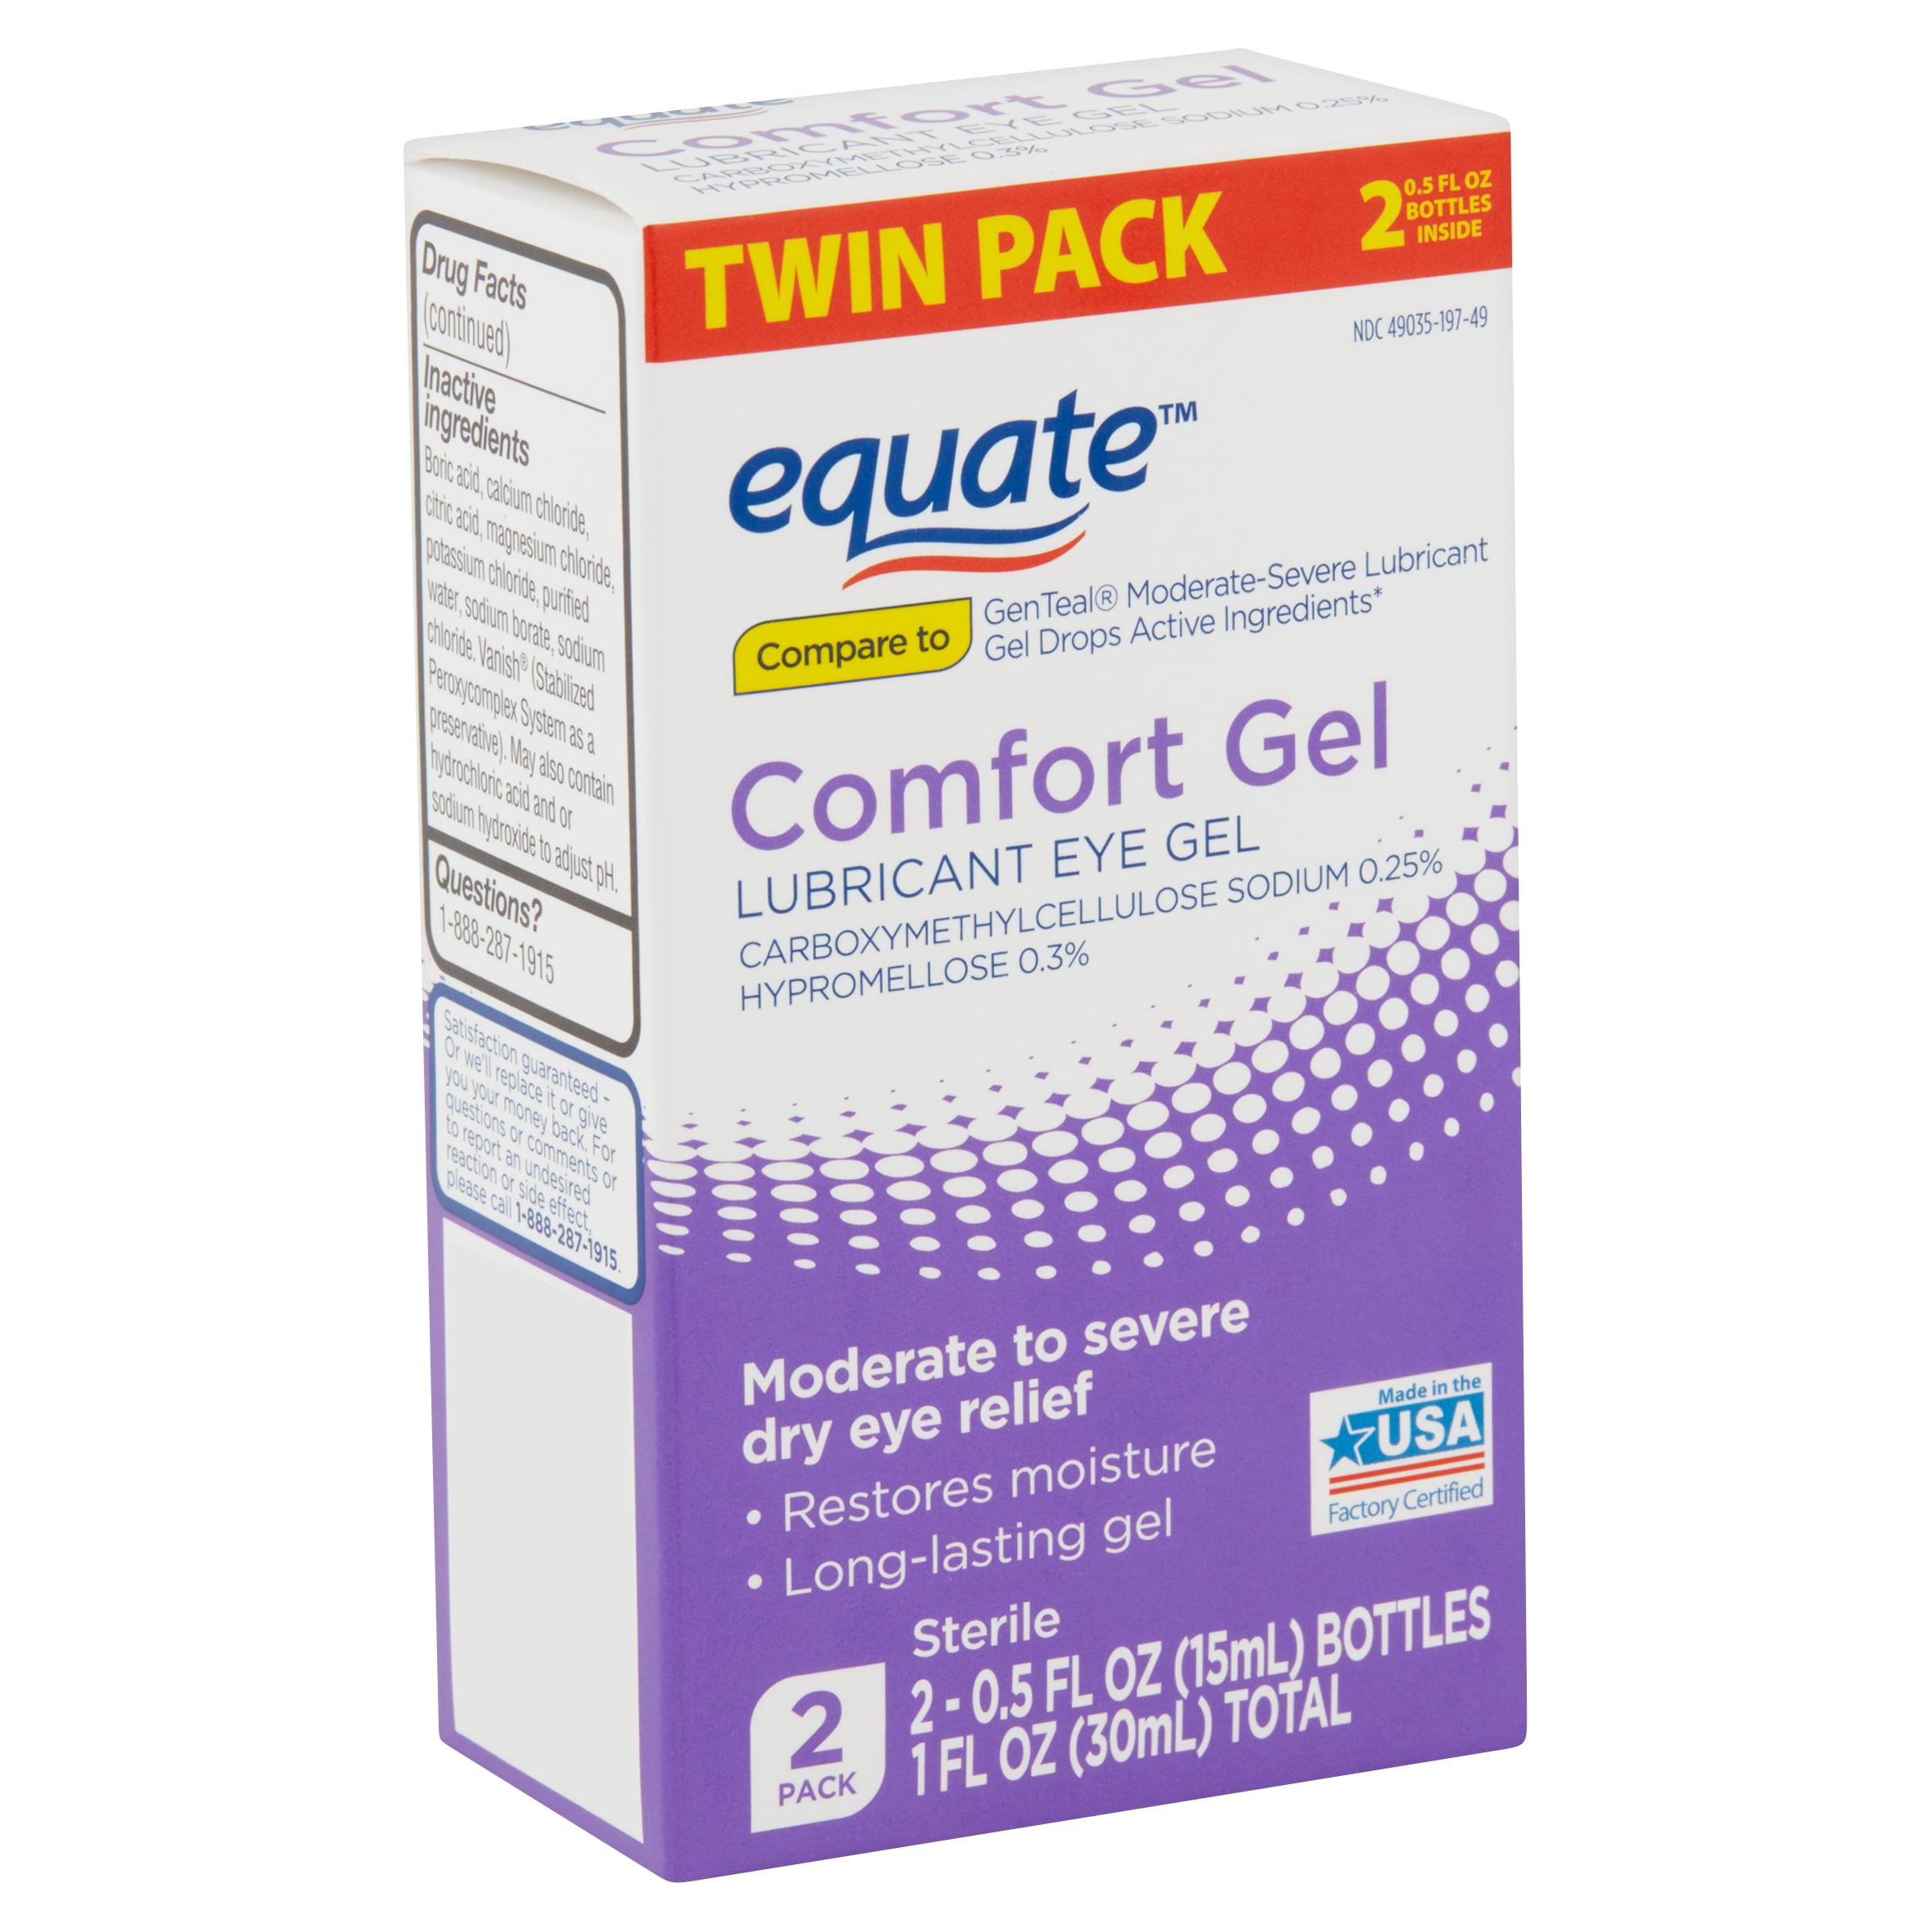 Equate Comfort Lubricant Eye Gel Twin Pack, 0.5 fl oz, 2 Count